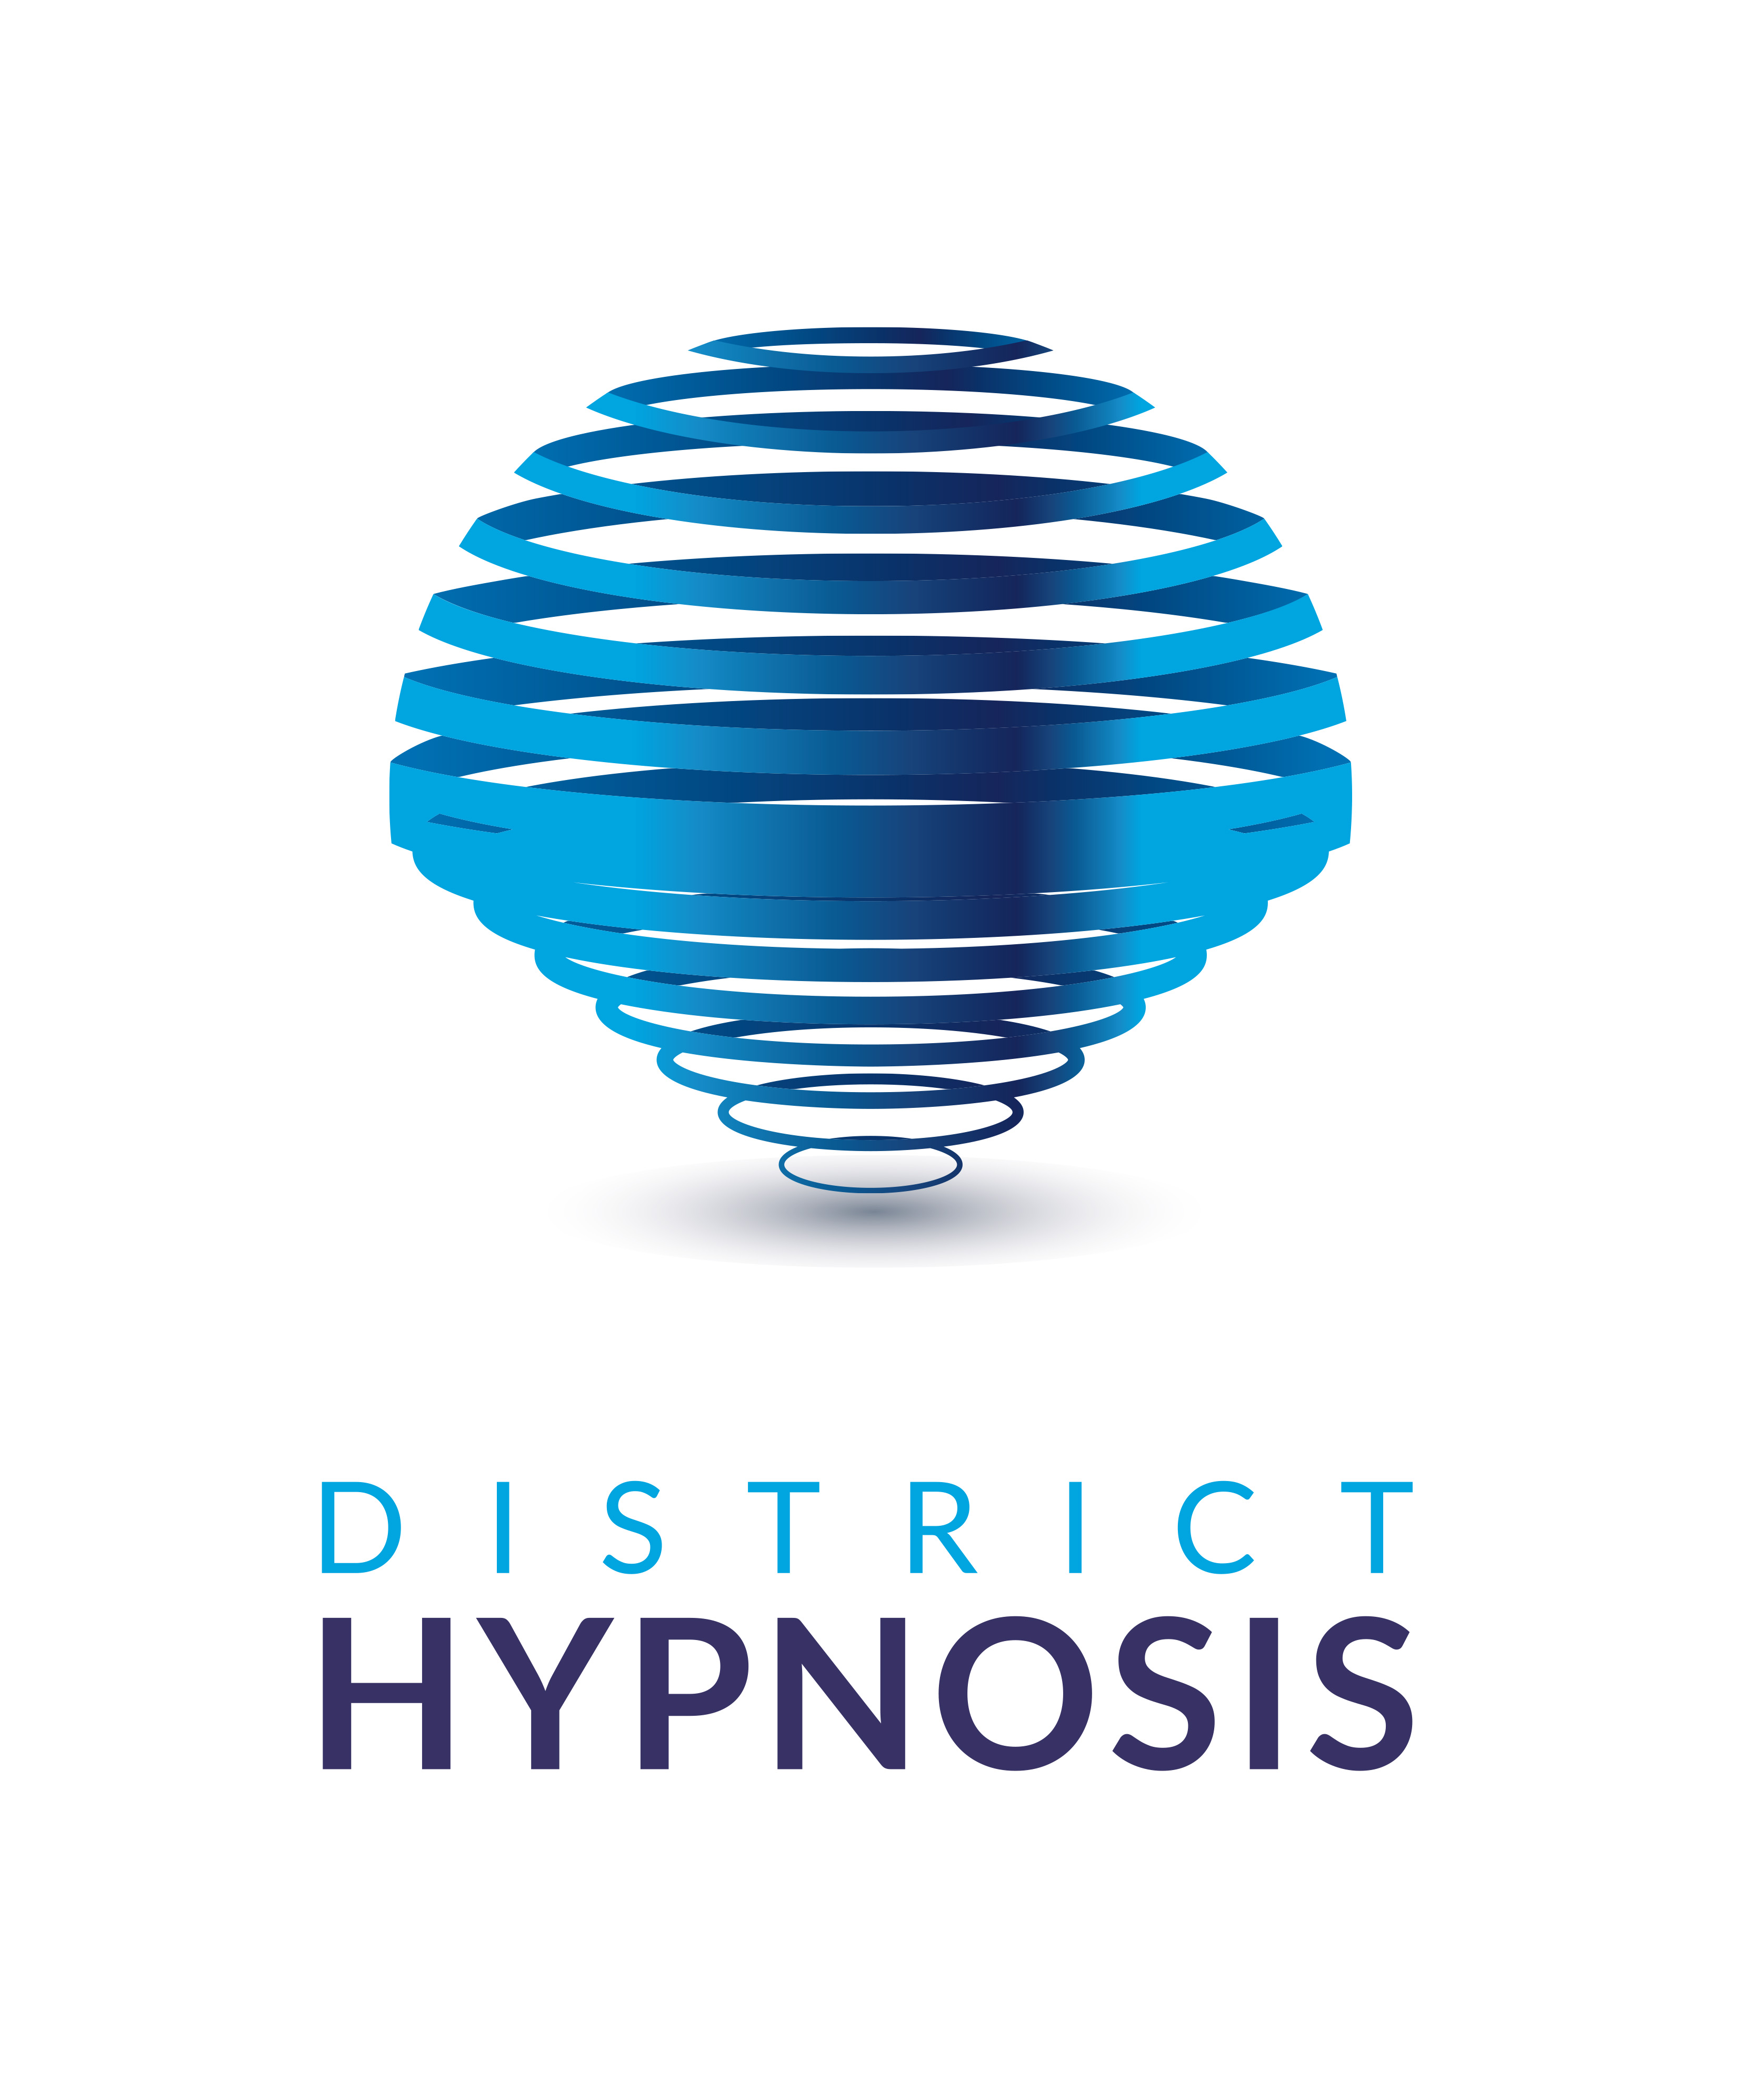 dh-logo-fullcolor-vertical